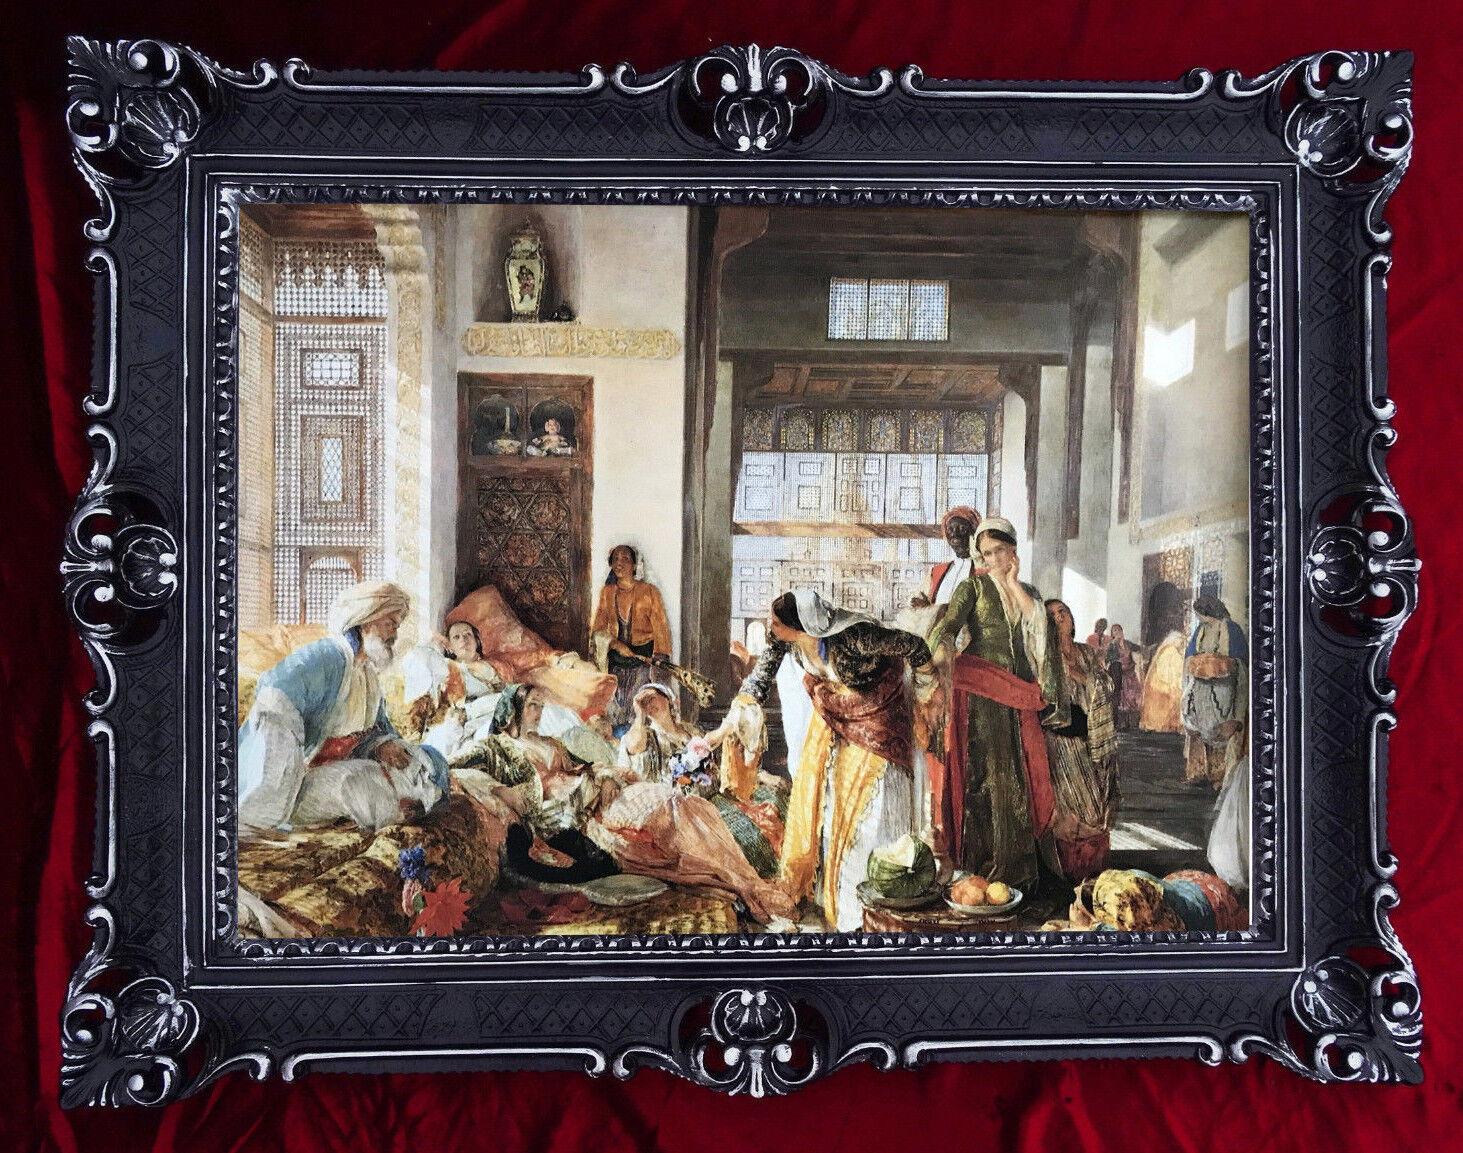 Gem lde orient basar orientalische bilder harem barock 90x70 wanddeko neu ebay - Orientalische wanddeko ...